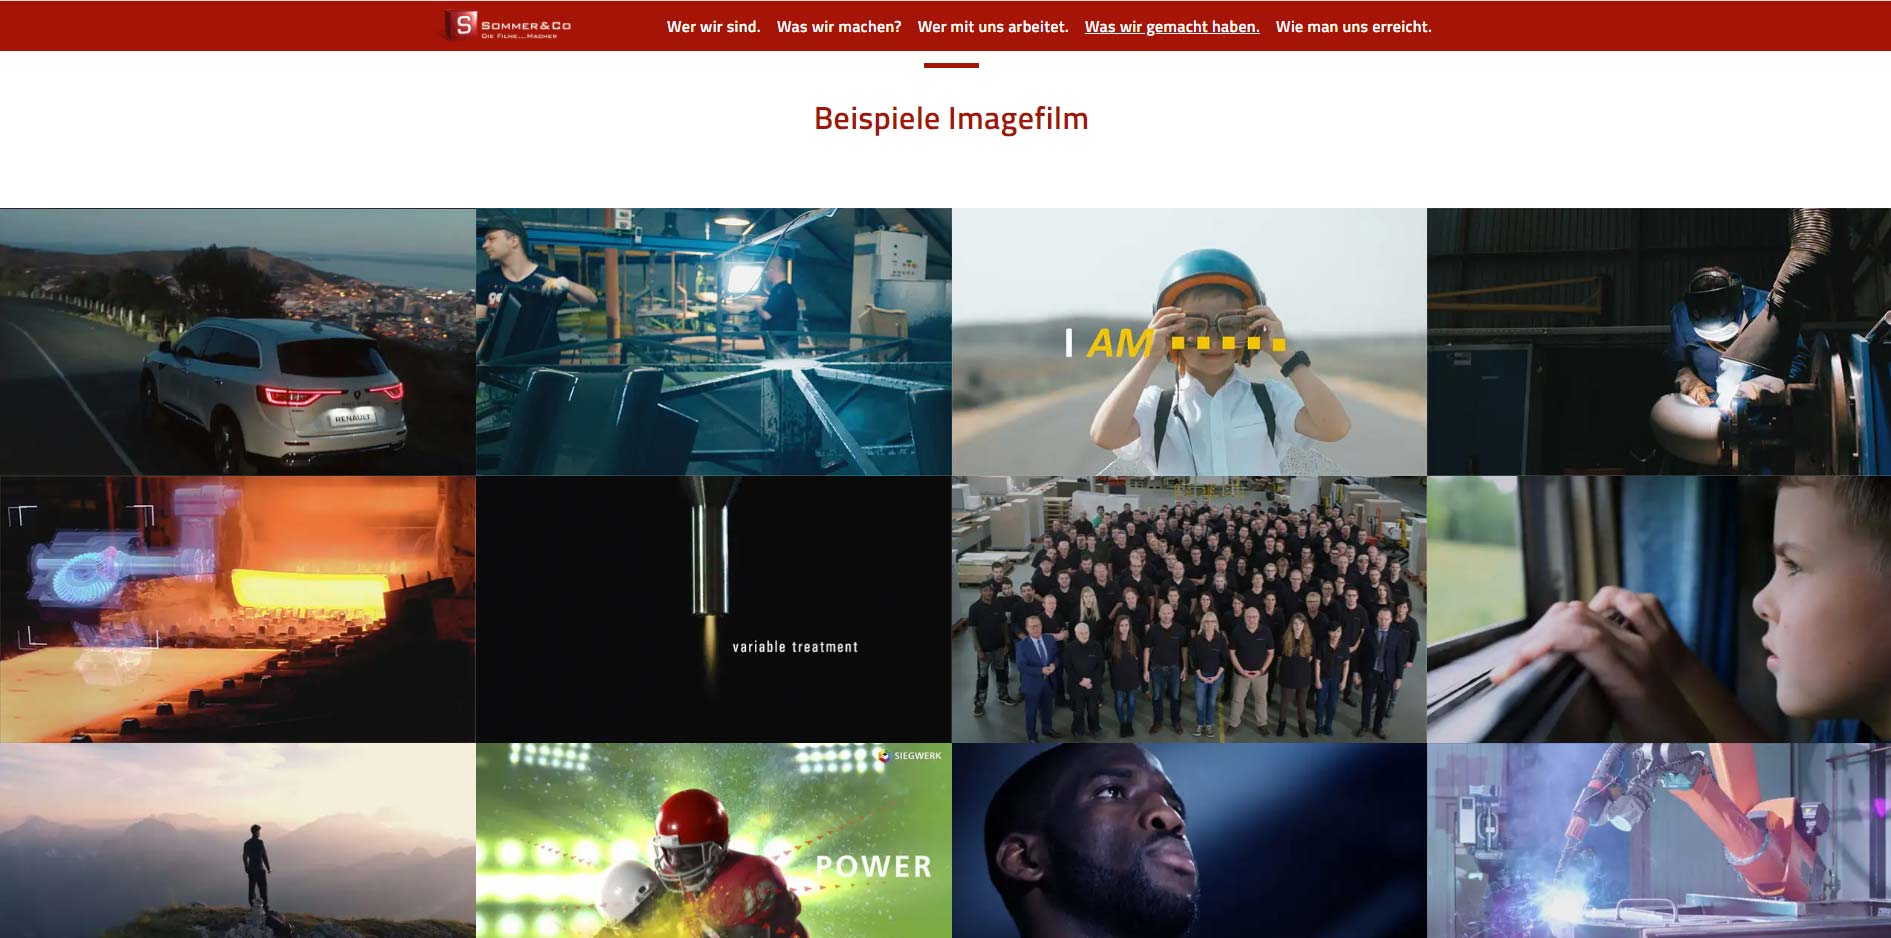 Imagefilm-Beispiele